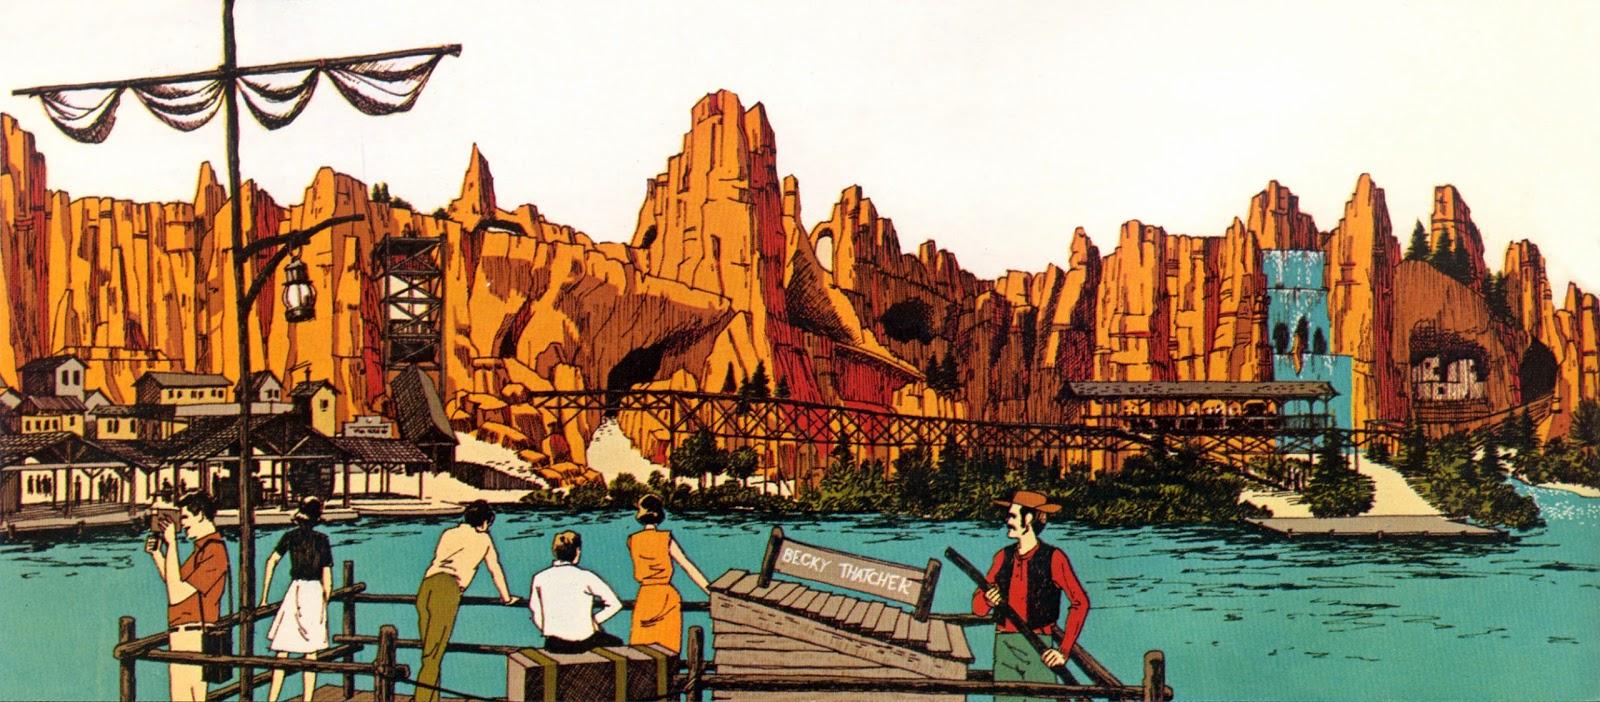 Thunder Mesa, Western River Expedition / Source : passport2dreams.blogspot.com